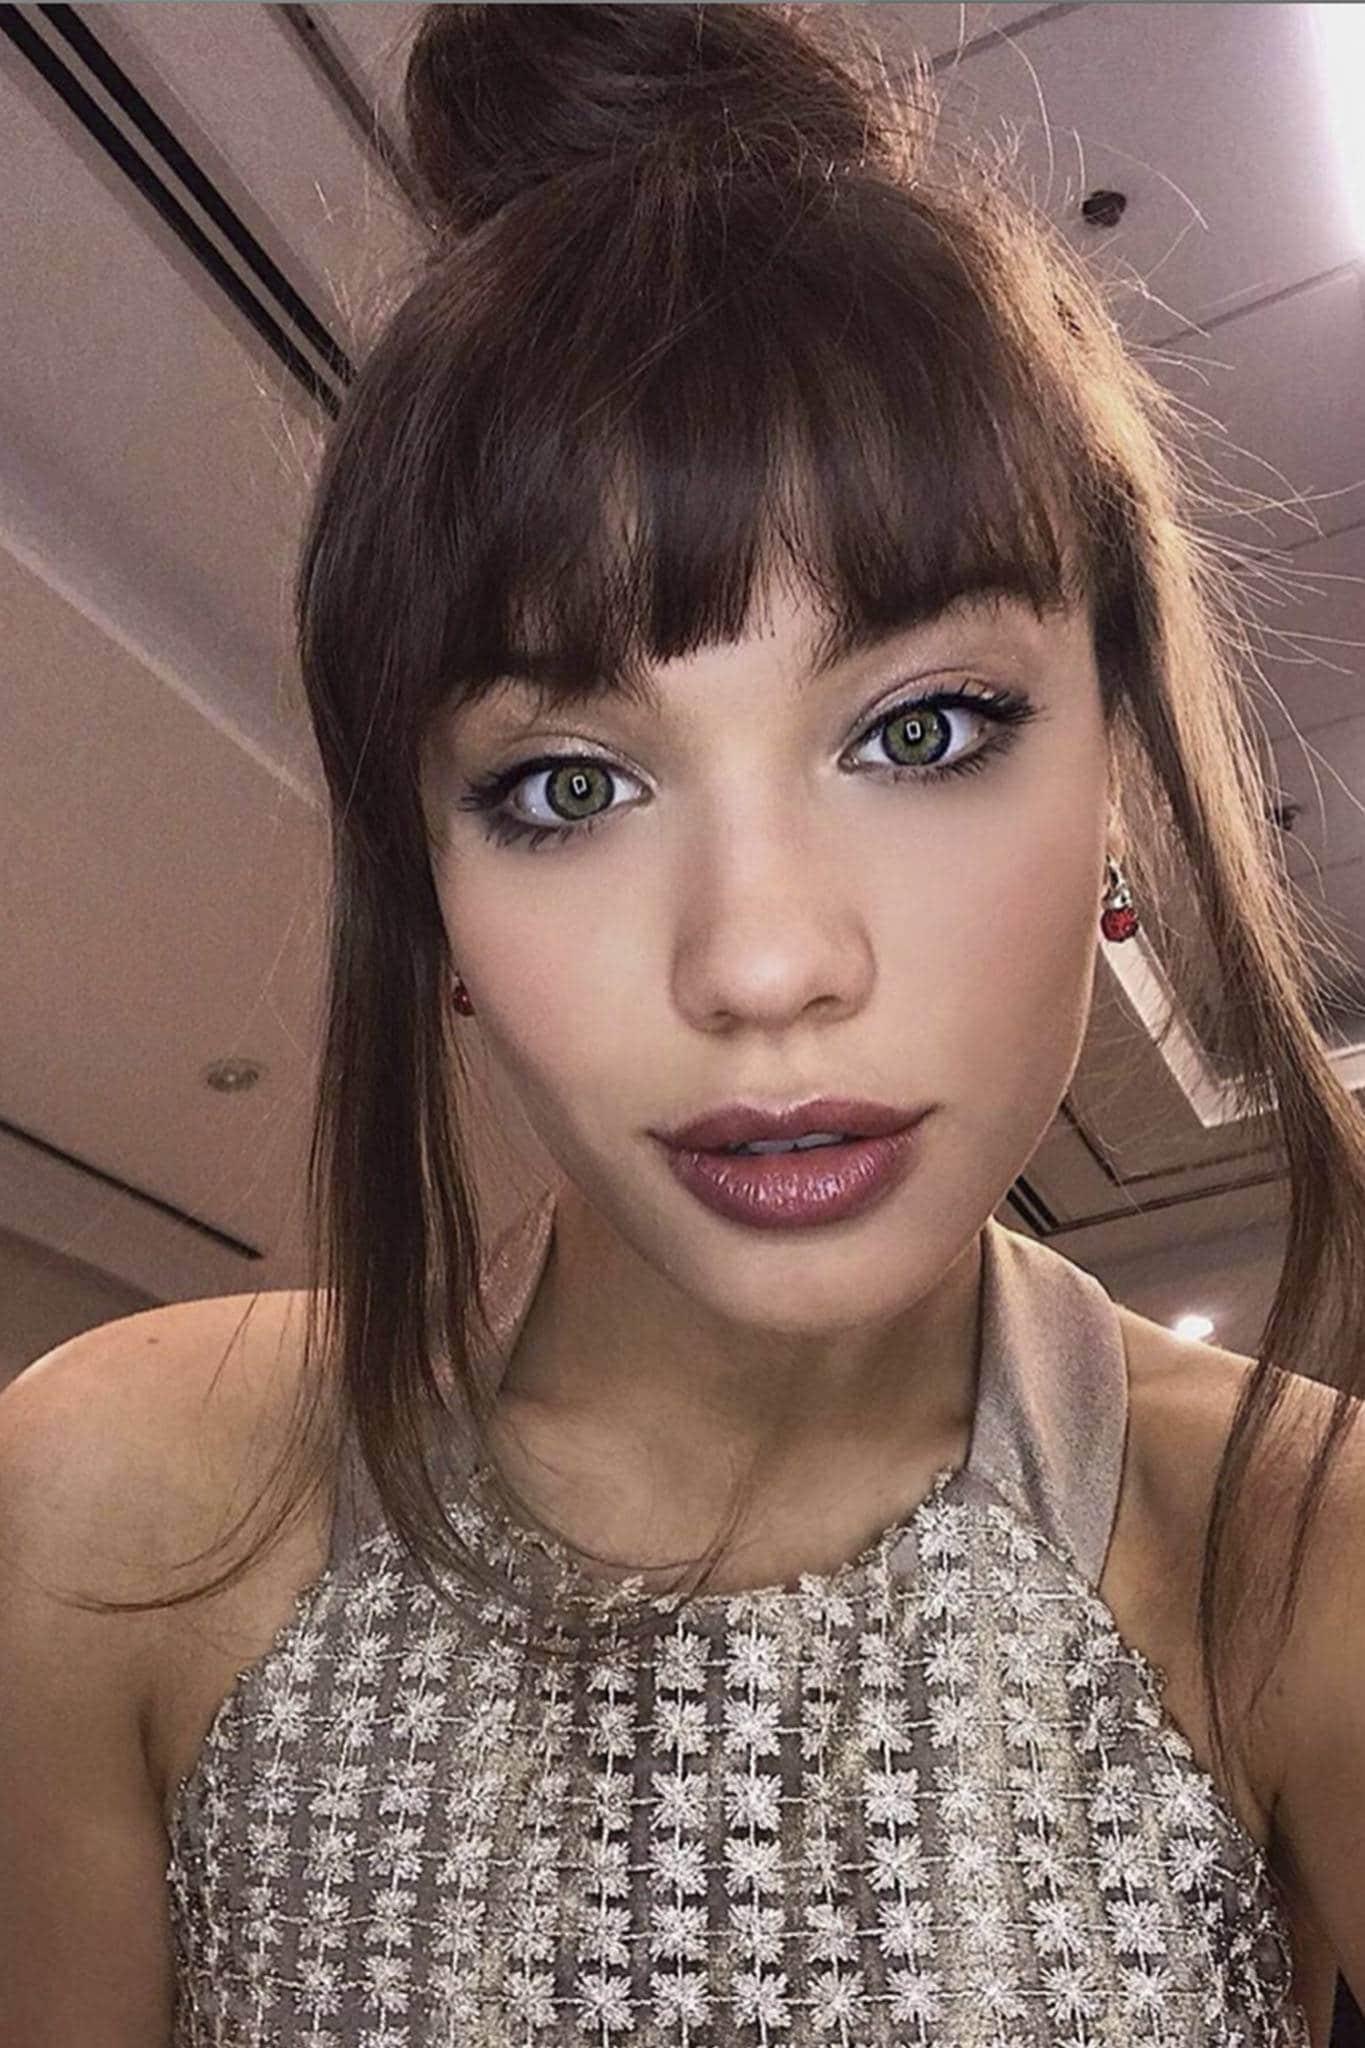 Malena Narvay con flequillo y rodete